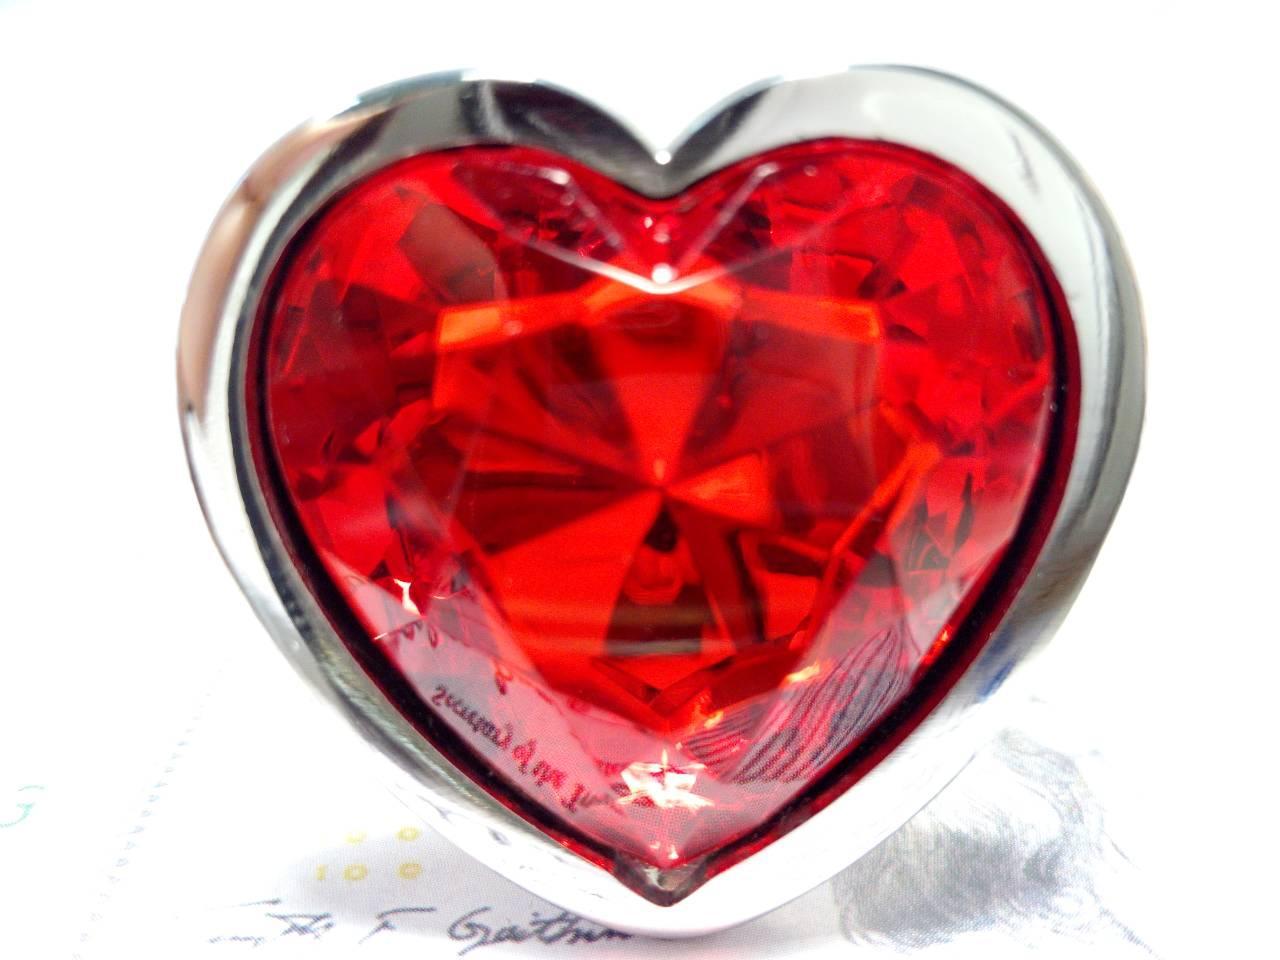 Анальная пробка Like Heart Love   + черный бархатный мешочек